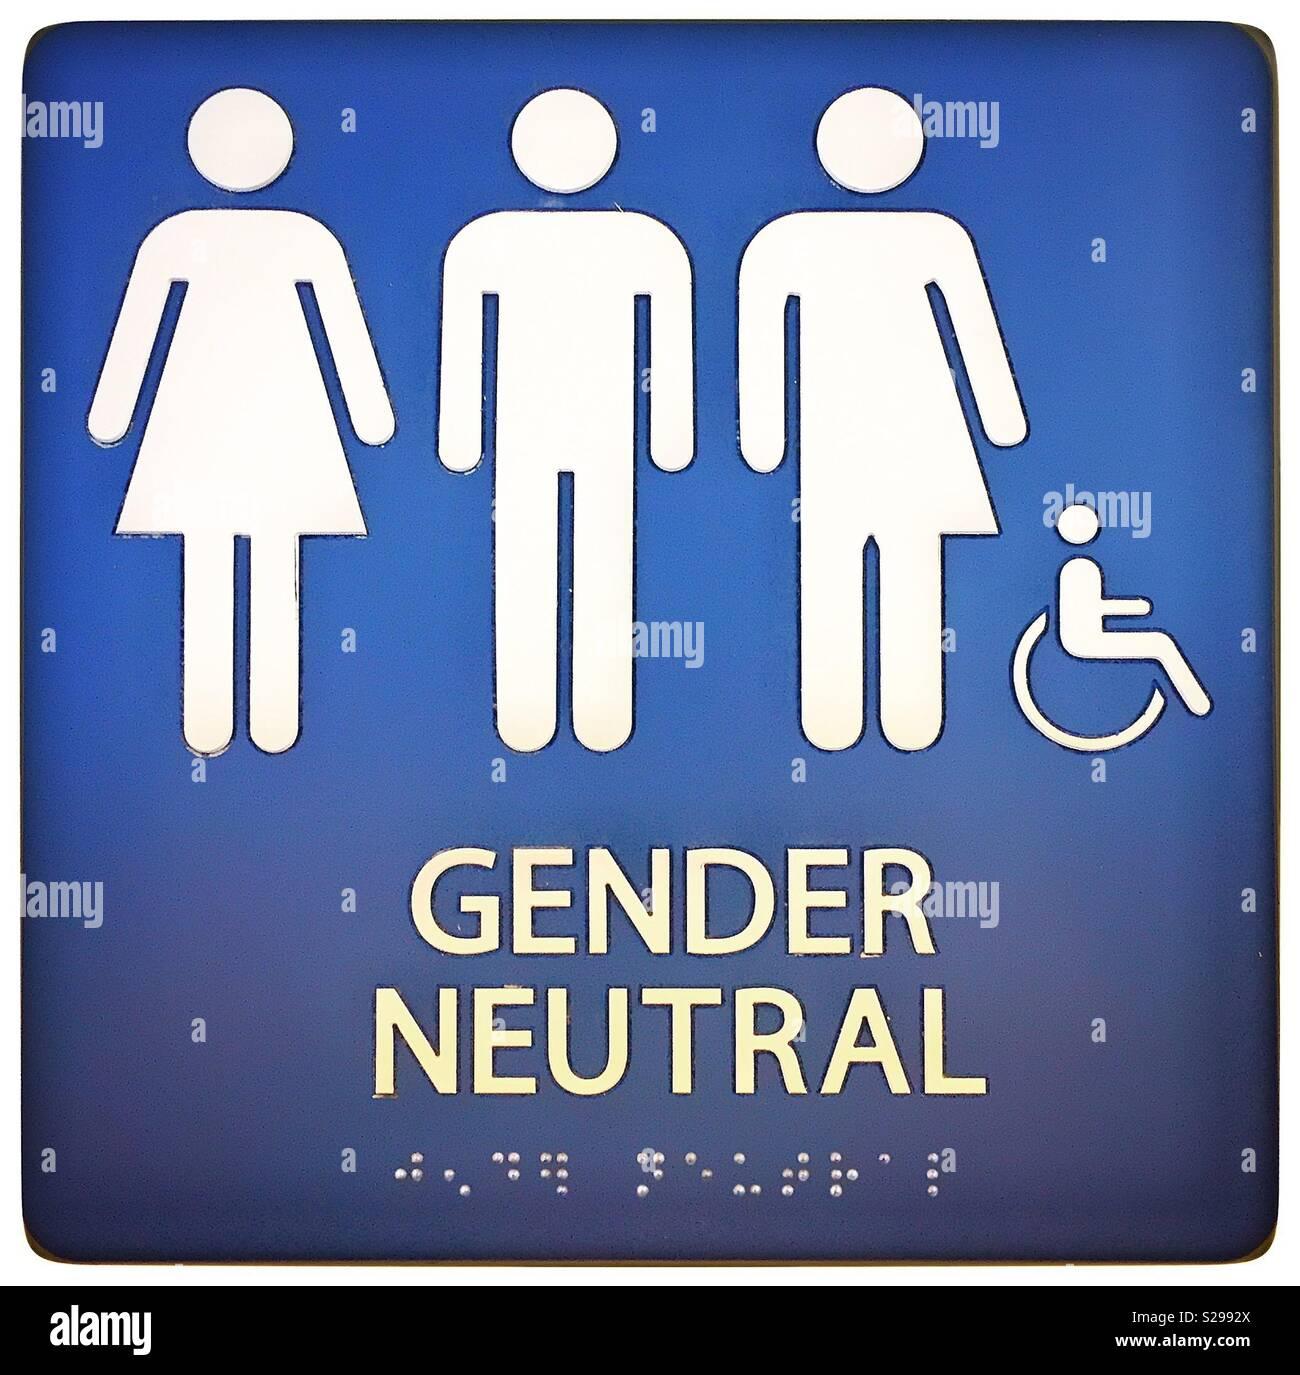 Gender Neutral Wheel Chair Accessible Braille Readable Bathroom Sign